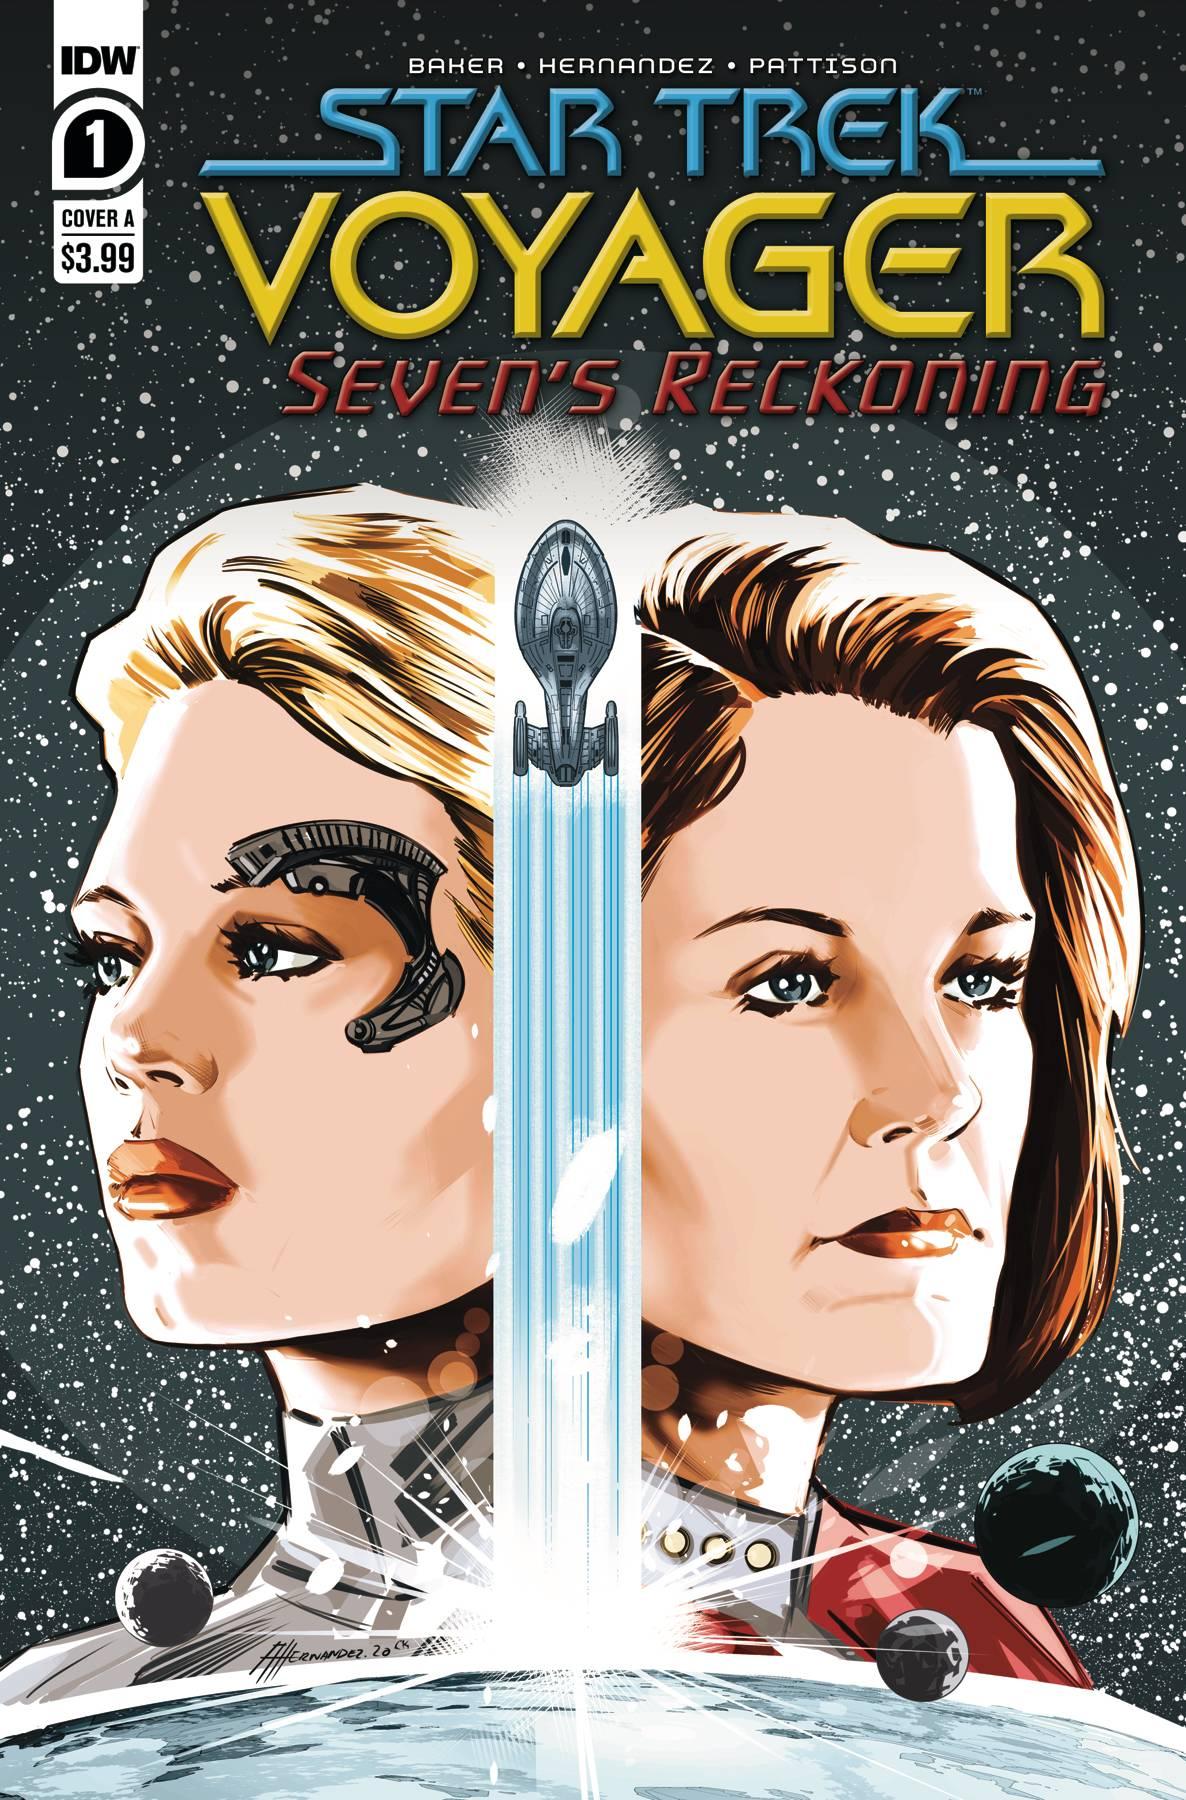 Star Trek: Voyager: Seven's Reckoning #1 (2020)